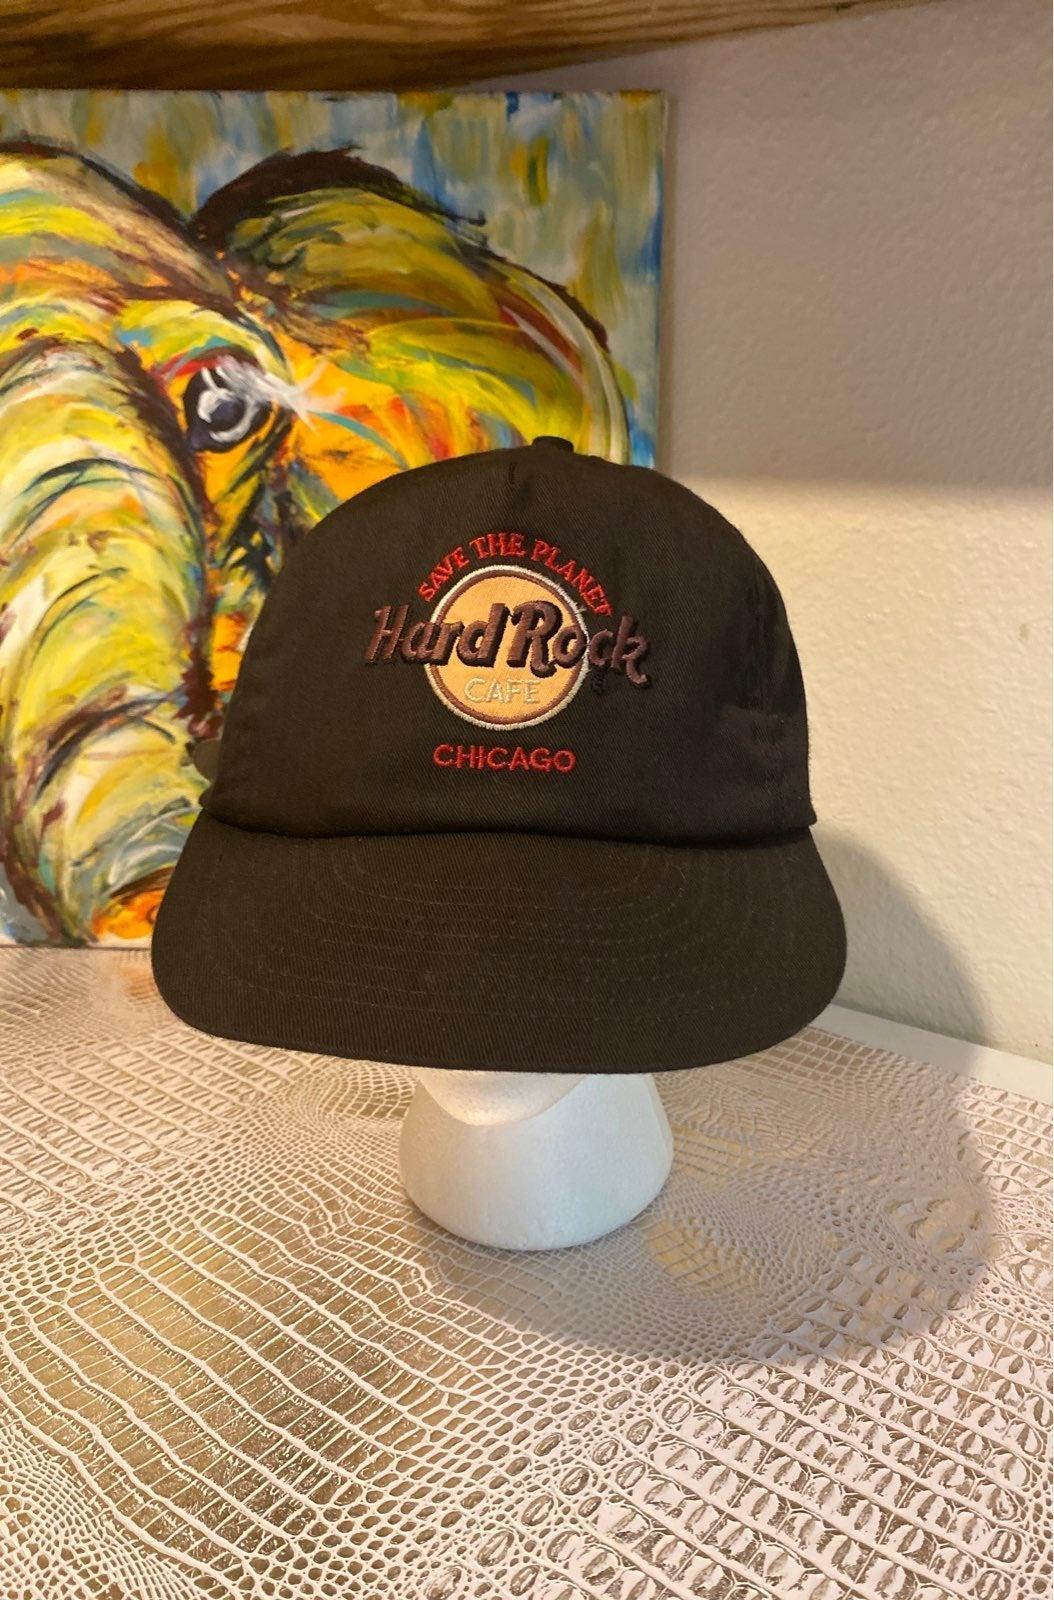 Hard rock Café of Chicago